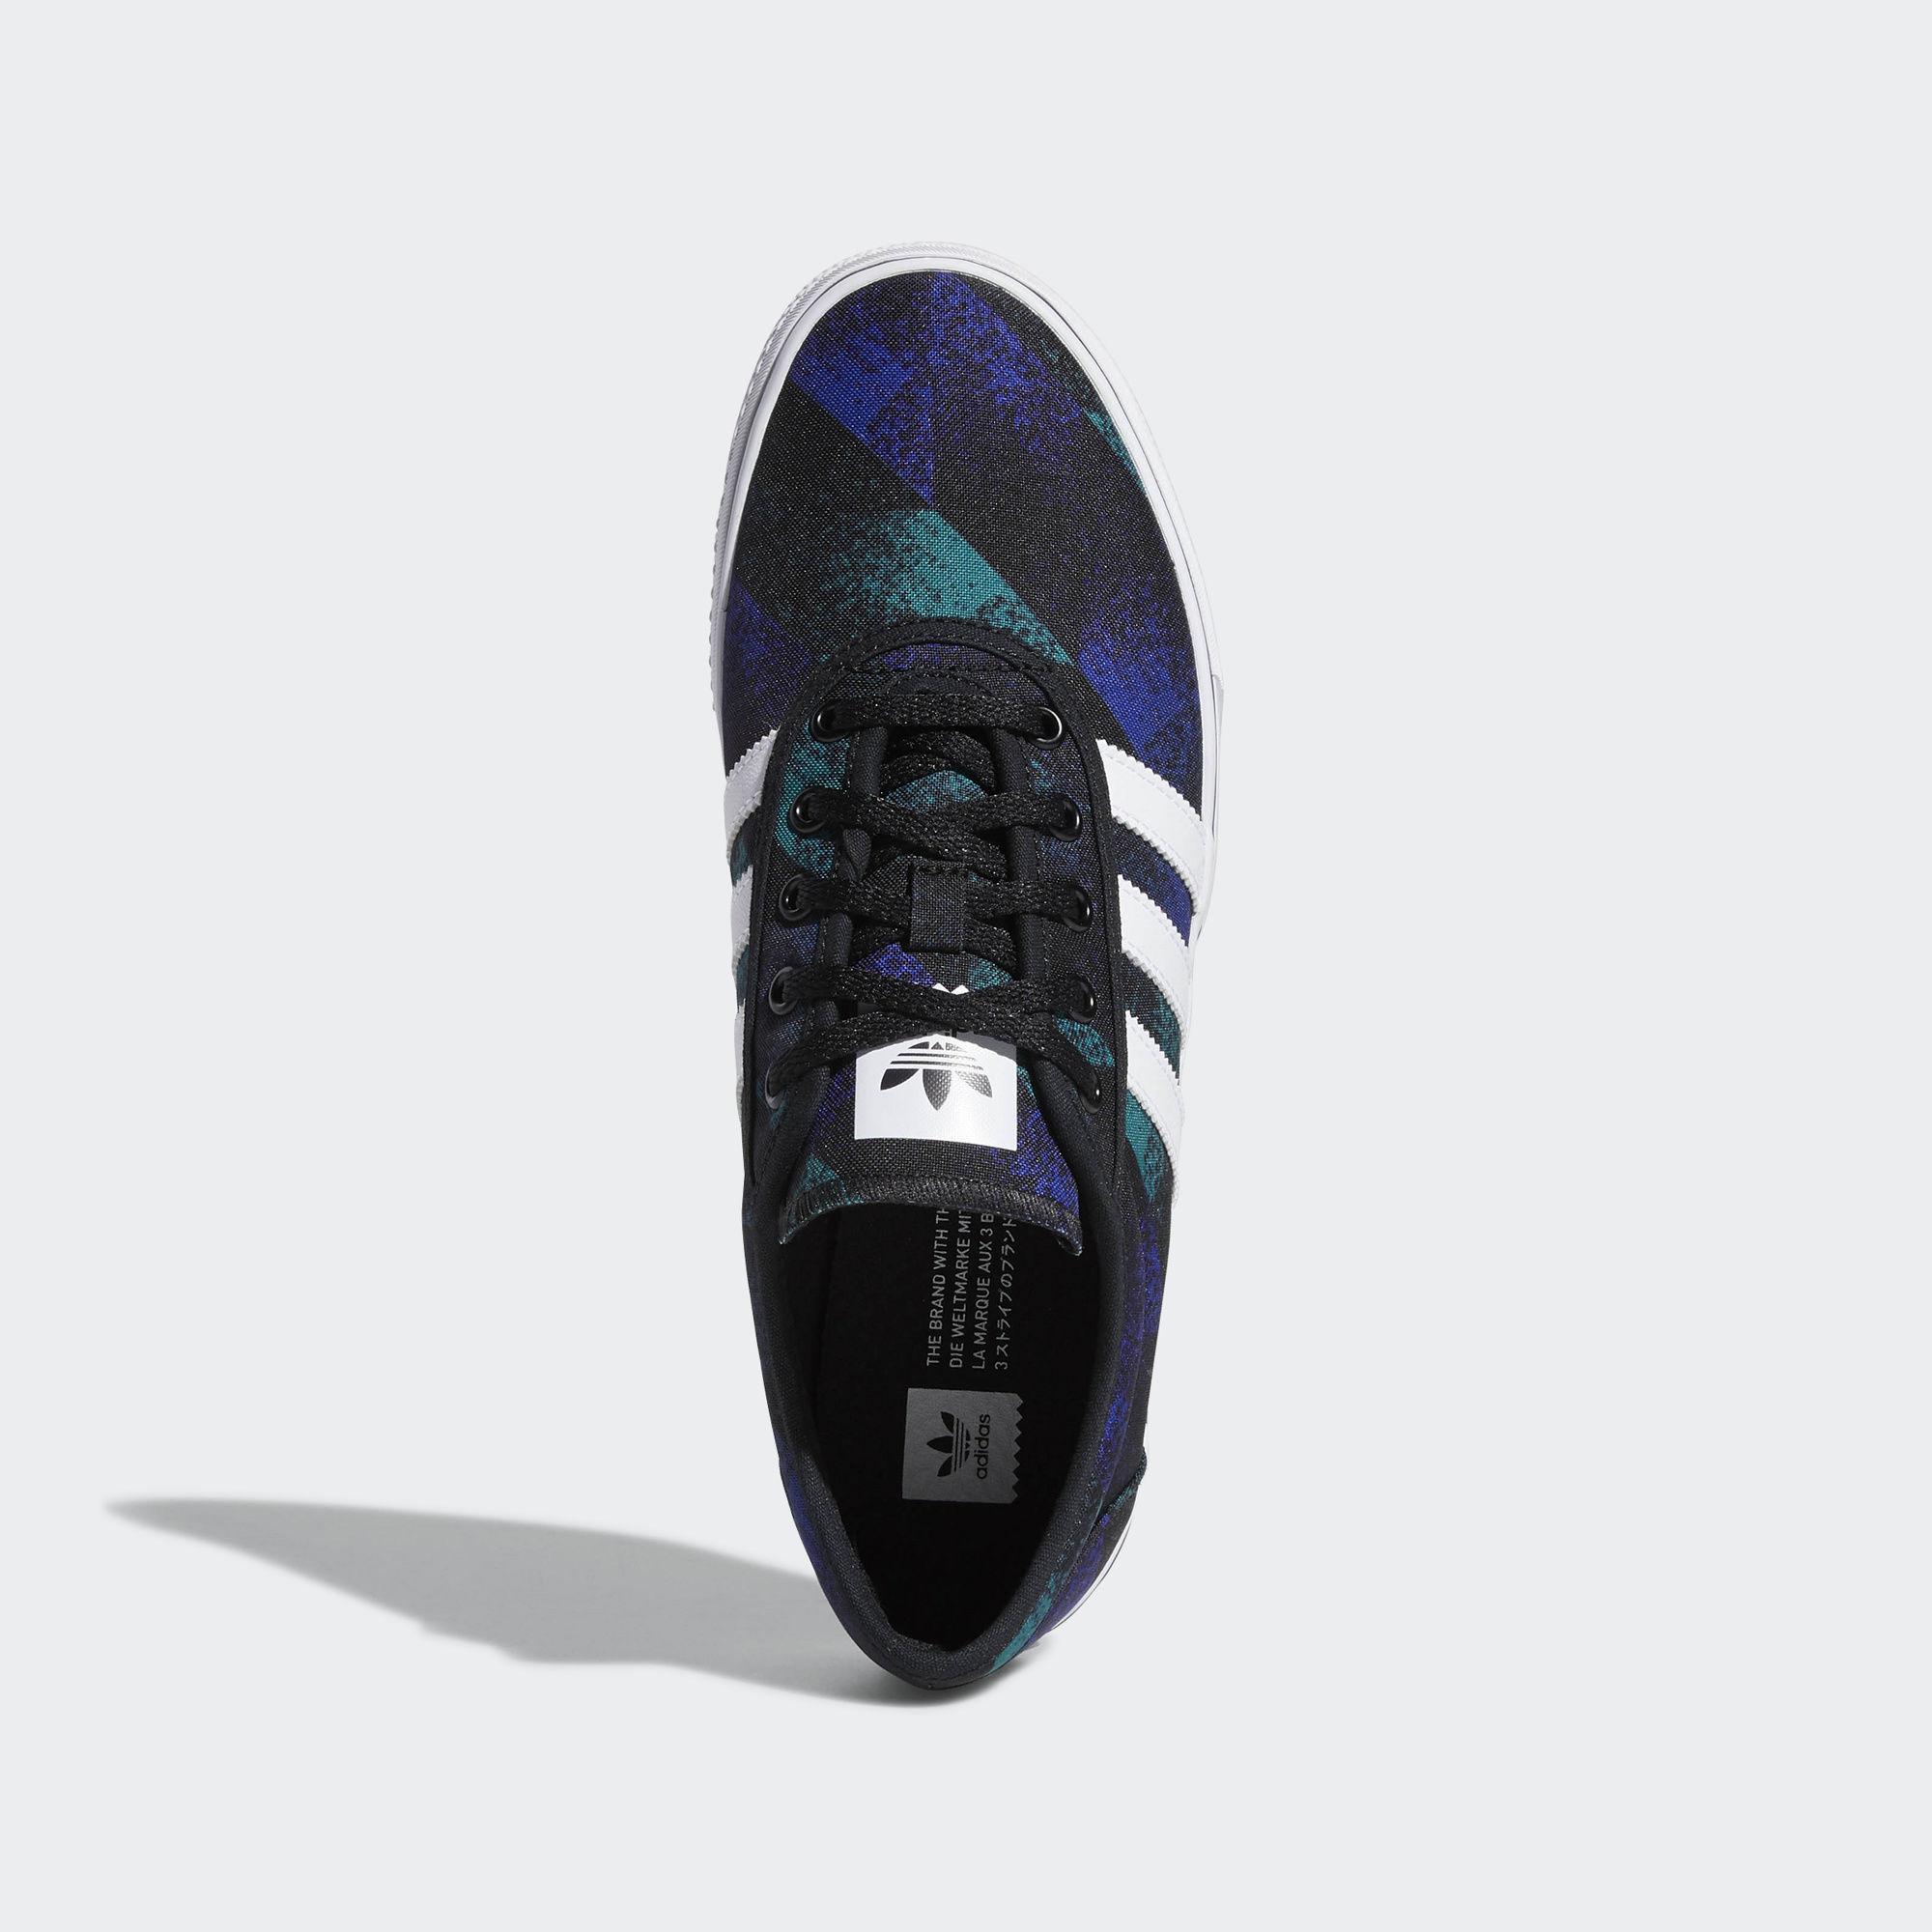 0b4bd7de8a4 Adidas - Multicolor Adiease Shoes for Men - Lyst. View fullscreen